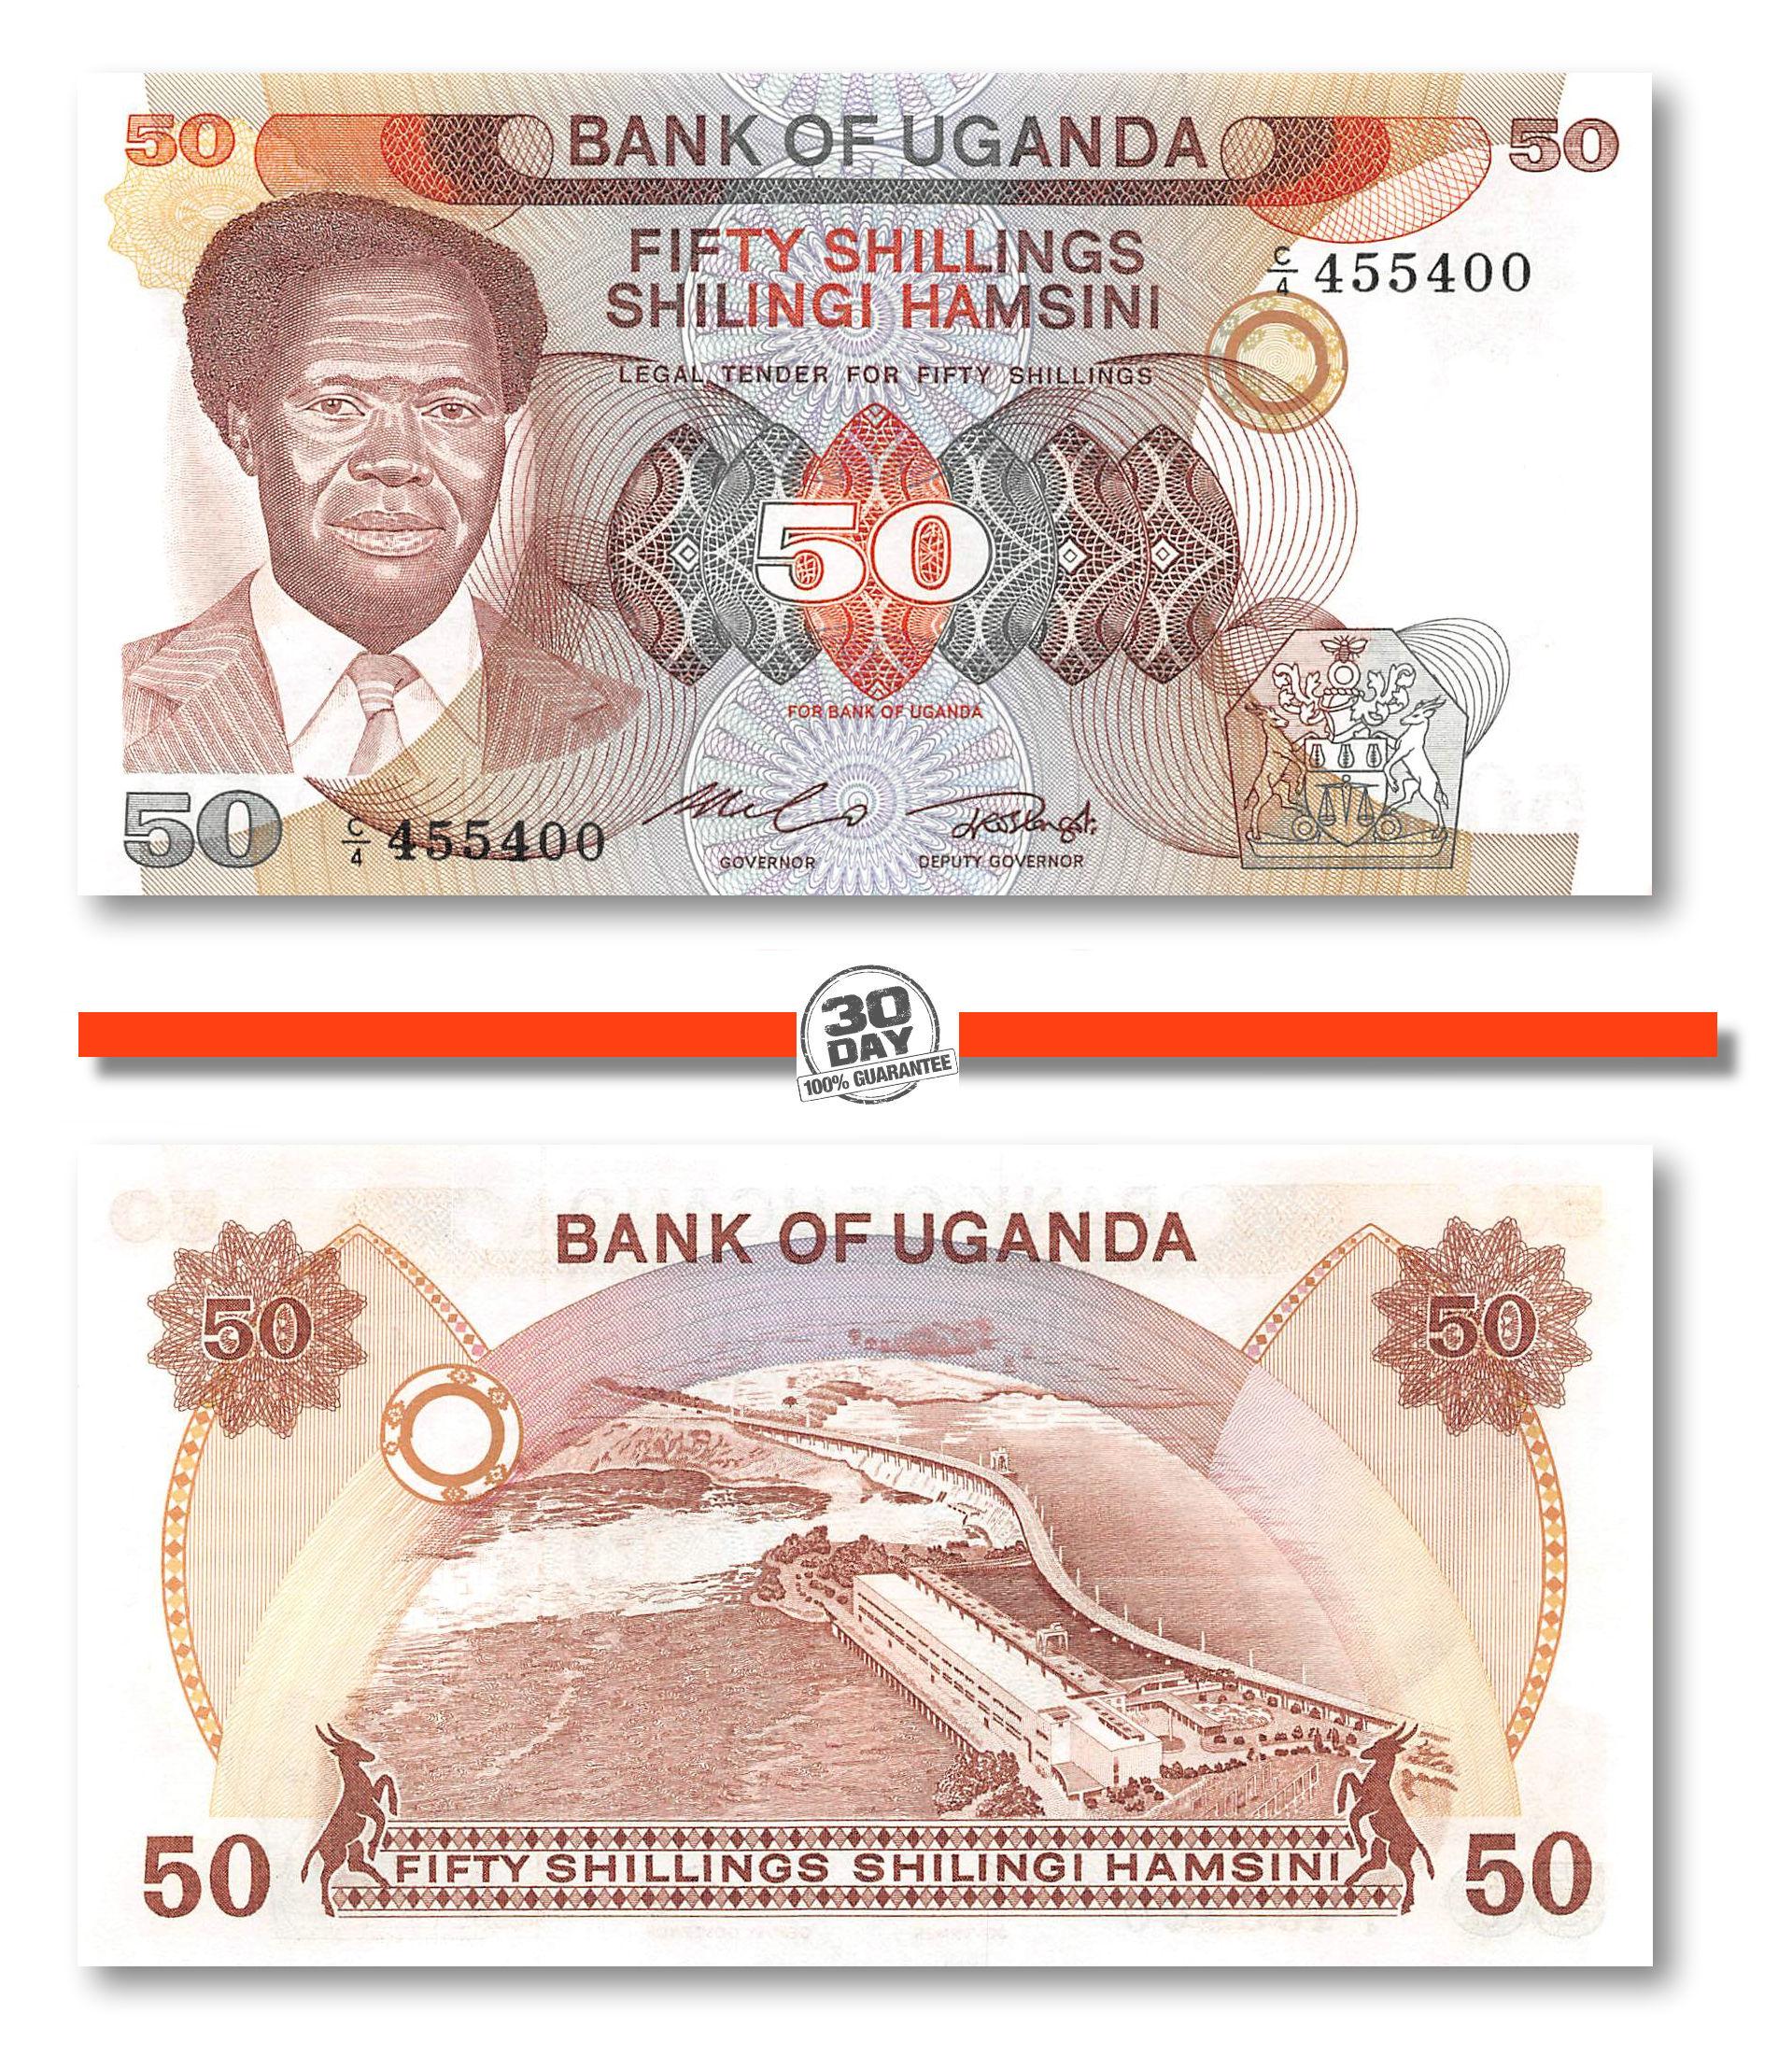 UGANDA 50 SHILLINGS 1985 UNC P-20